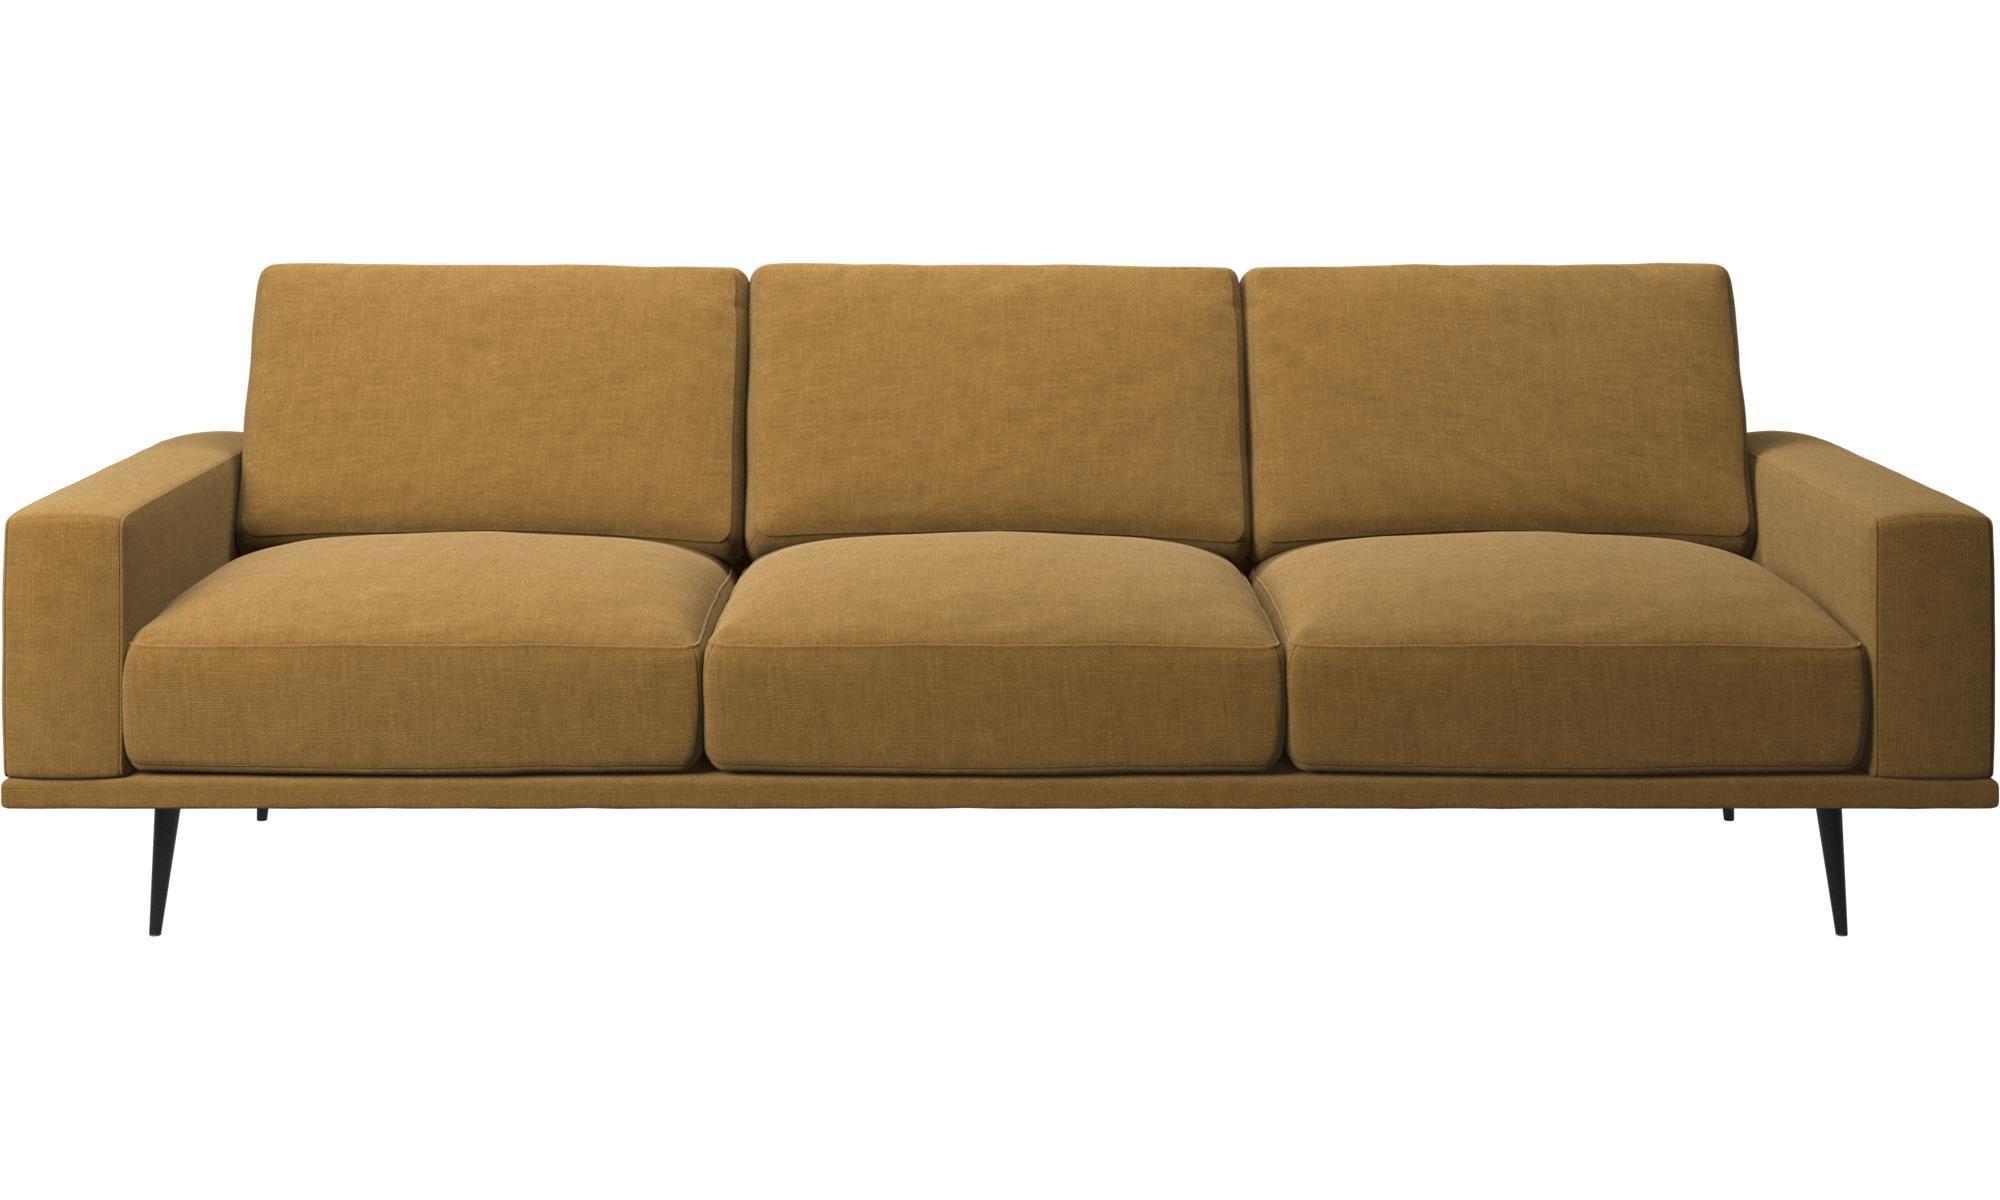 Epingle Sur Chairs Sofa